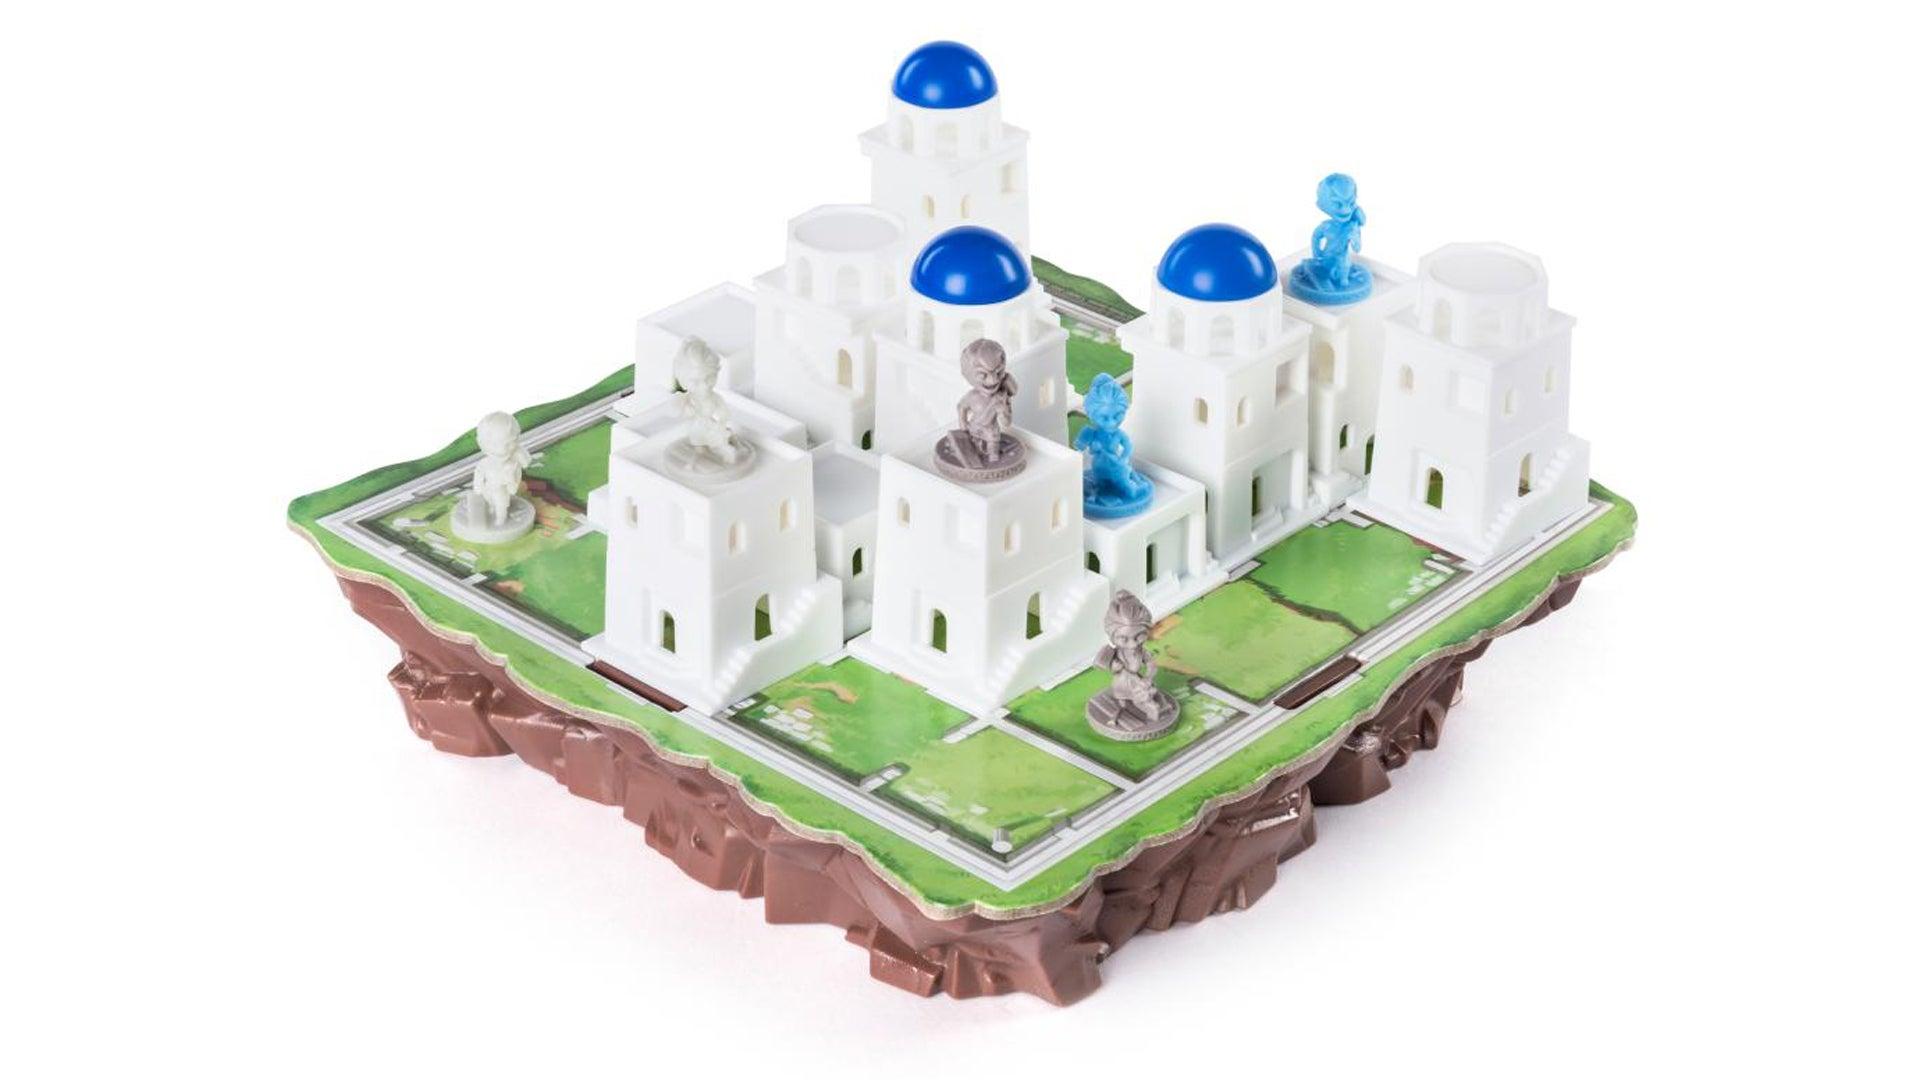 santorini-board-game-gameplay.jpg